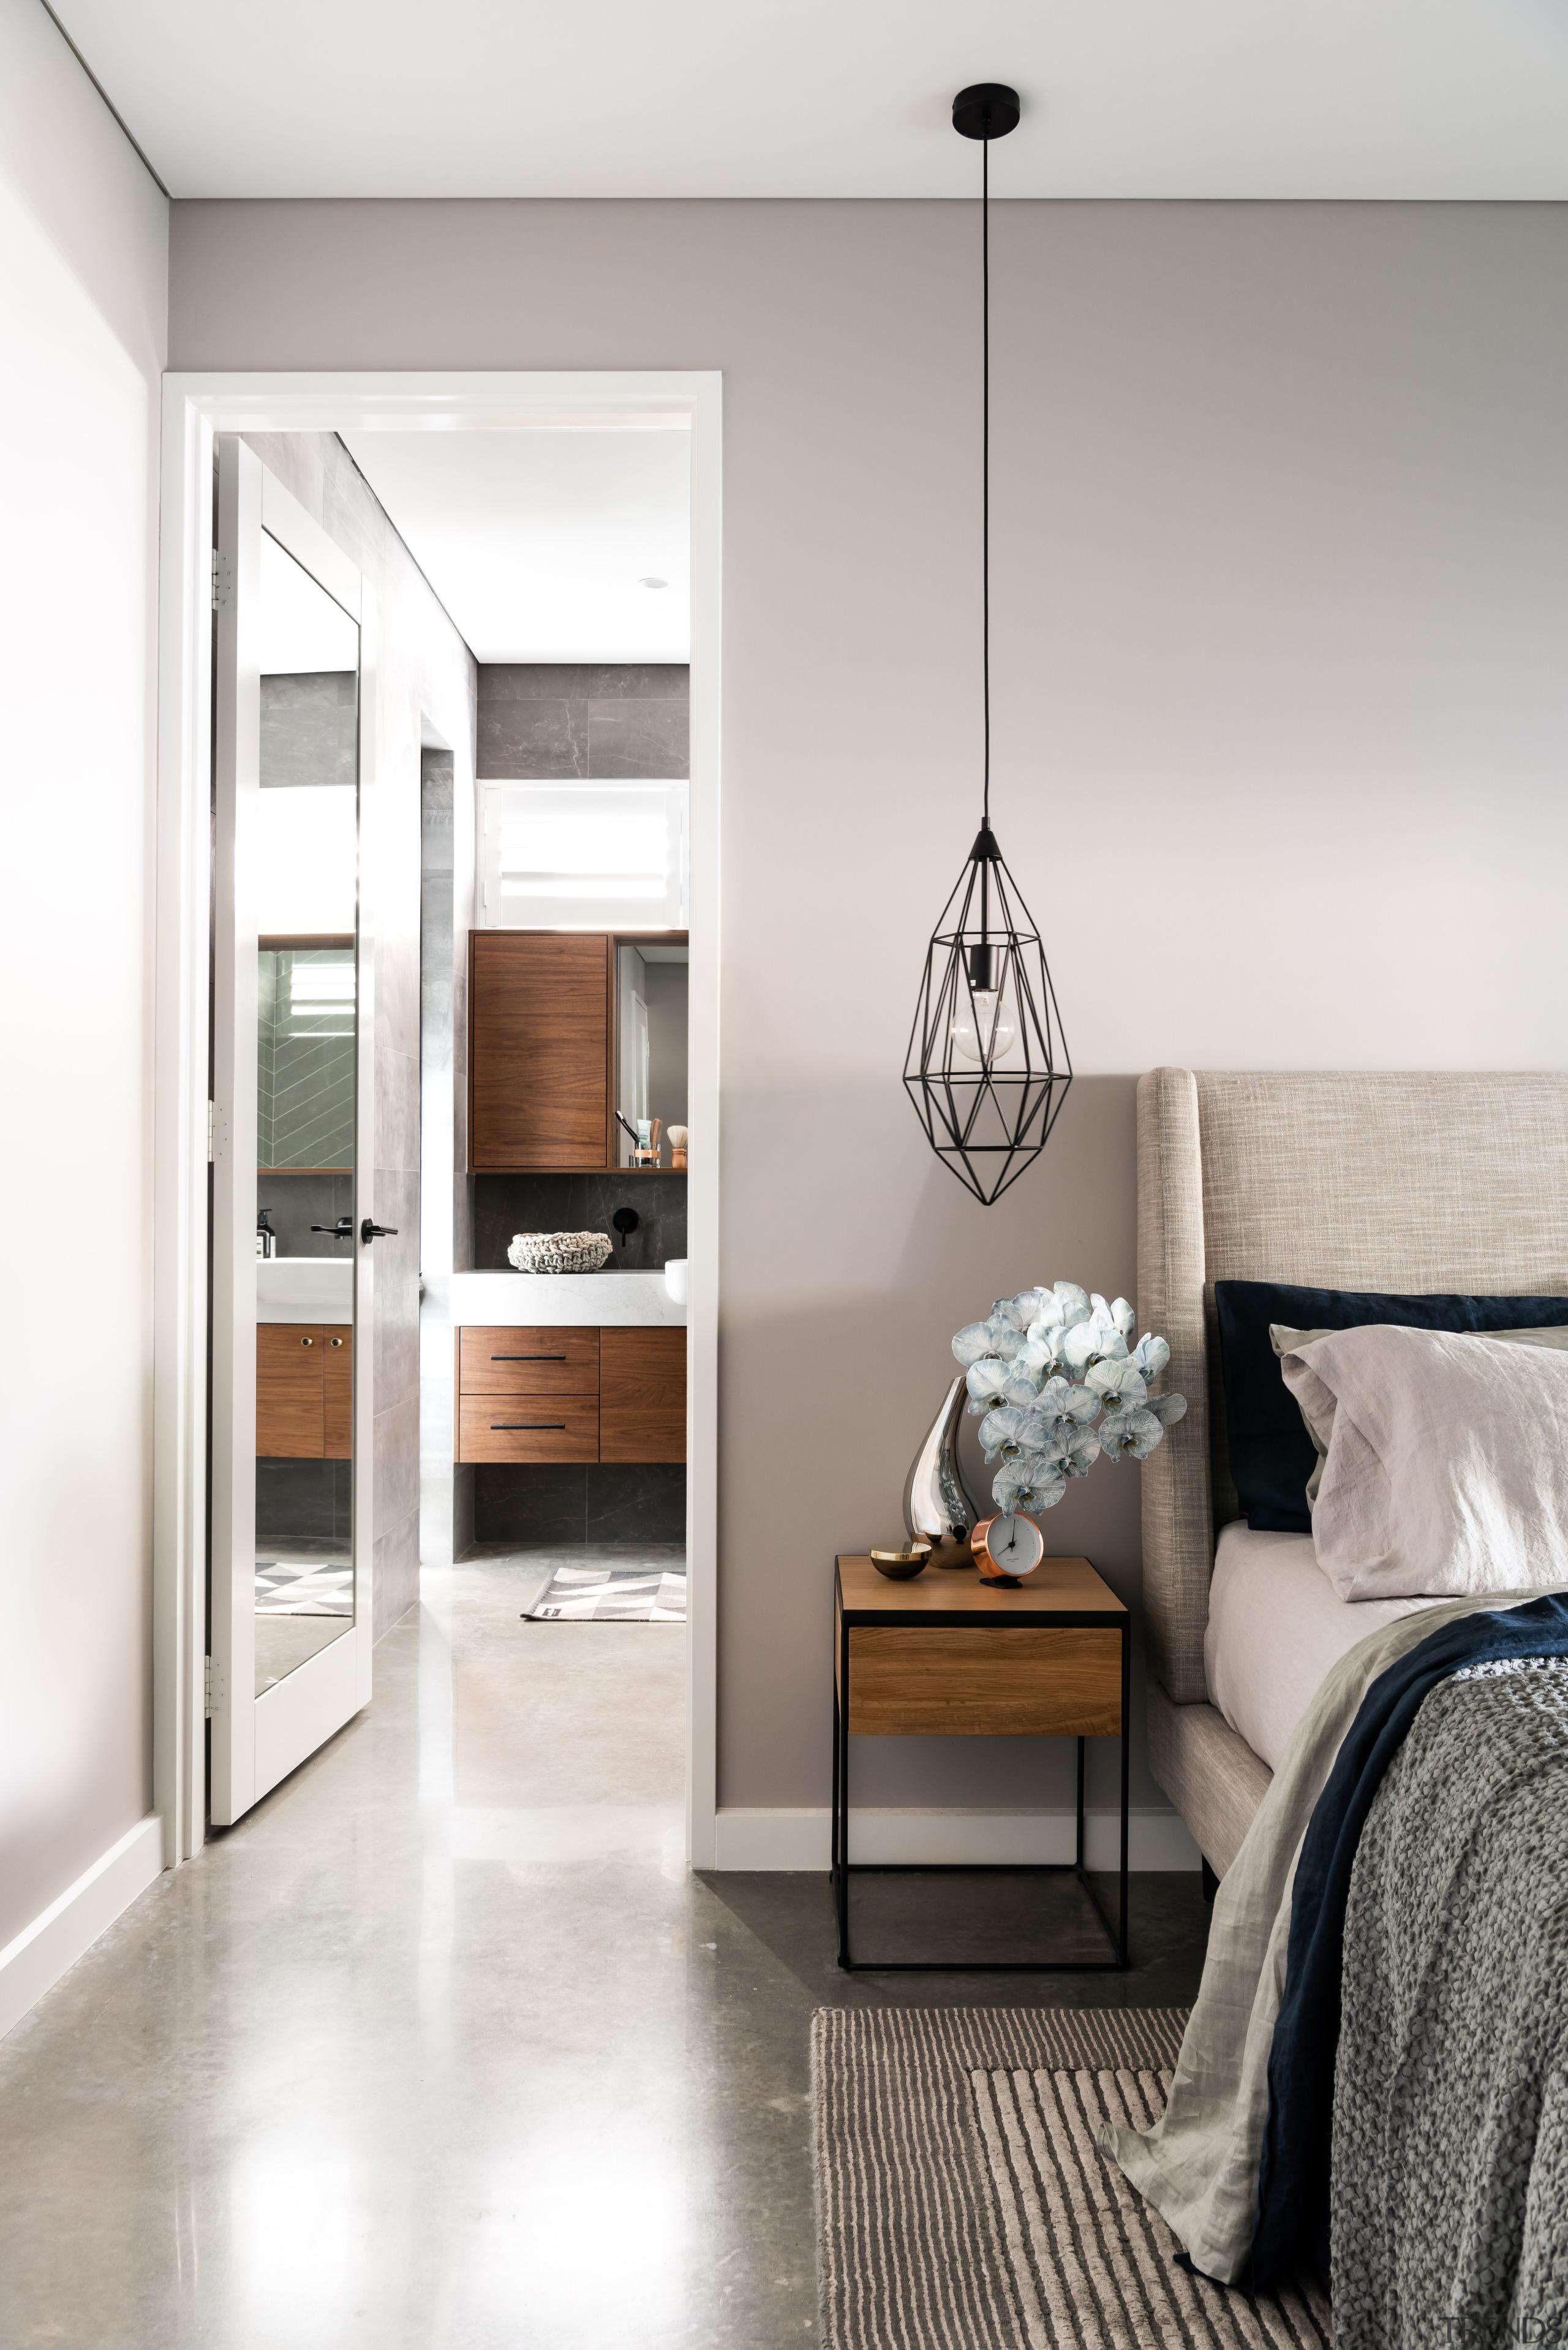 Pale wall and floor tones let the timber bed, bedroom, beige, floor, flooring, furniture, home, house, interior design, concrete flooring, light fixture, lighting, bedroom, table, wood, Dalecki Design